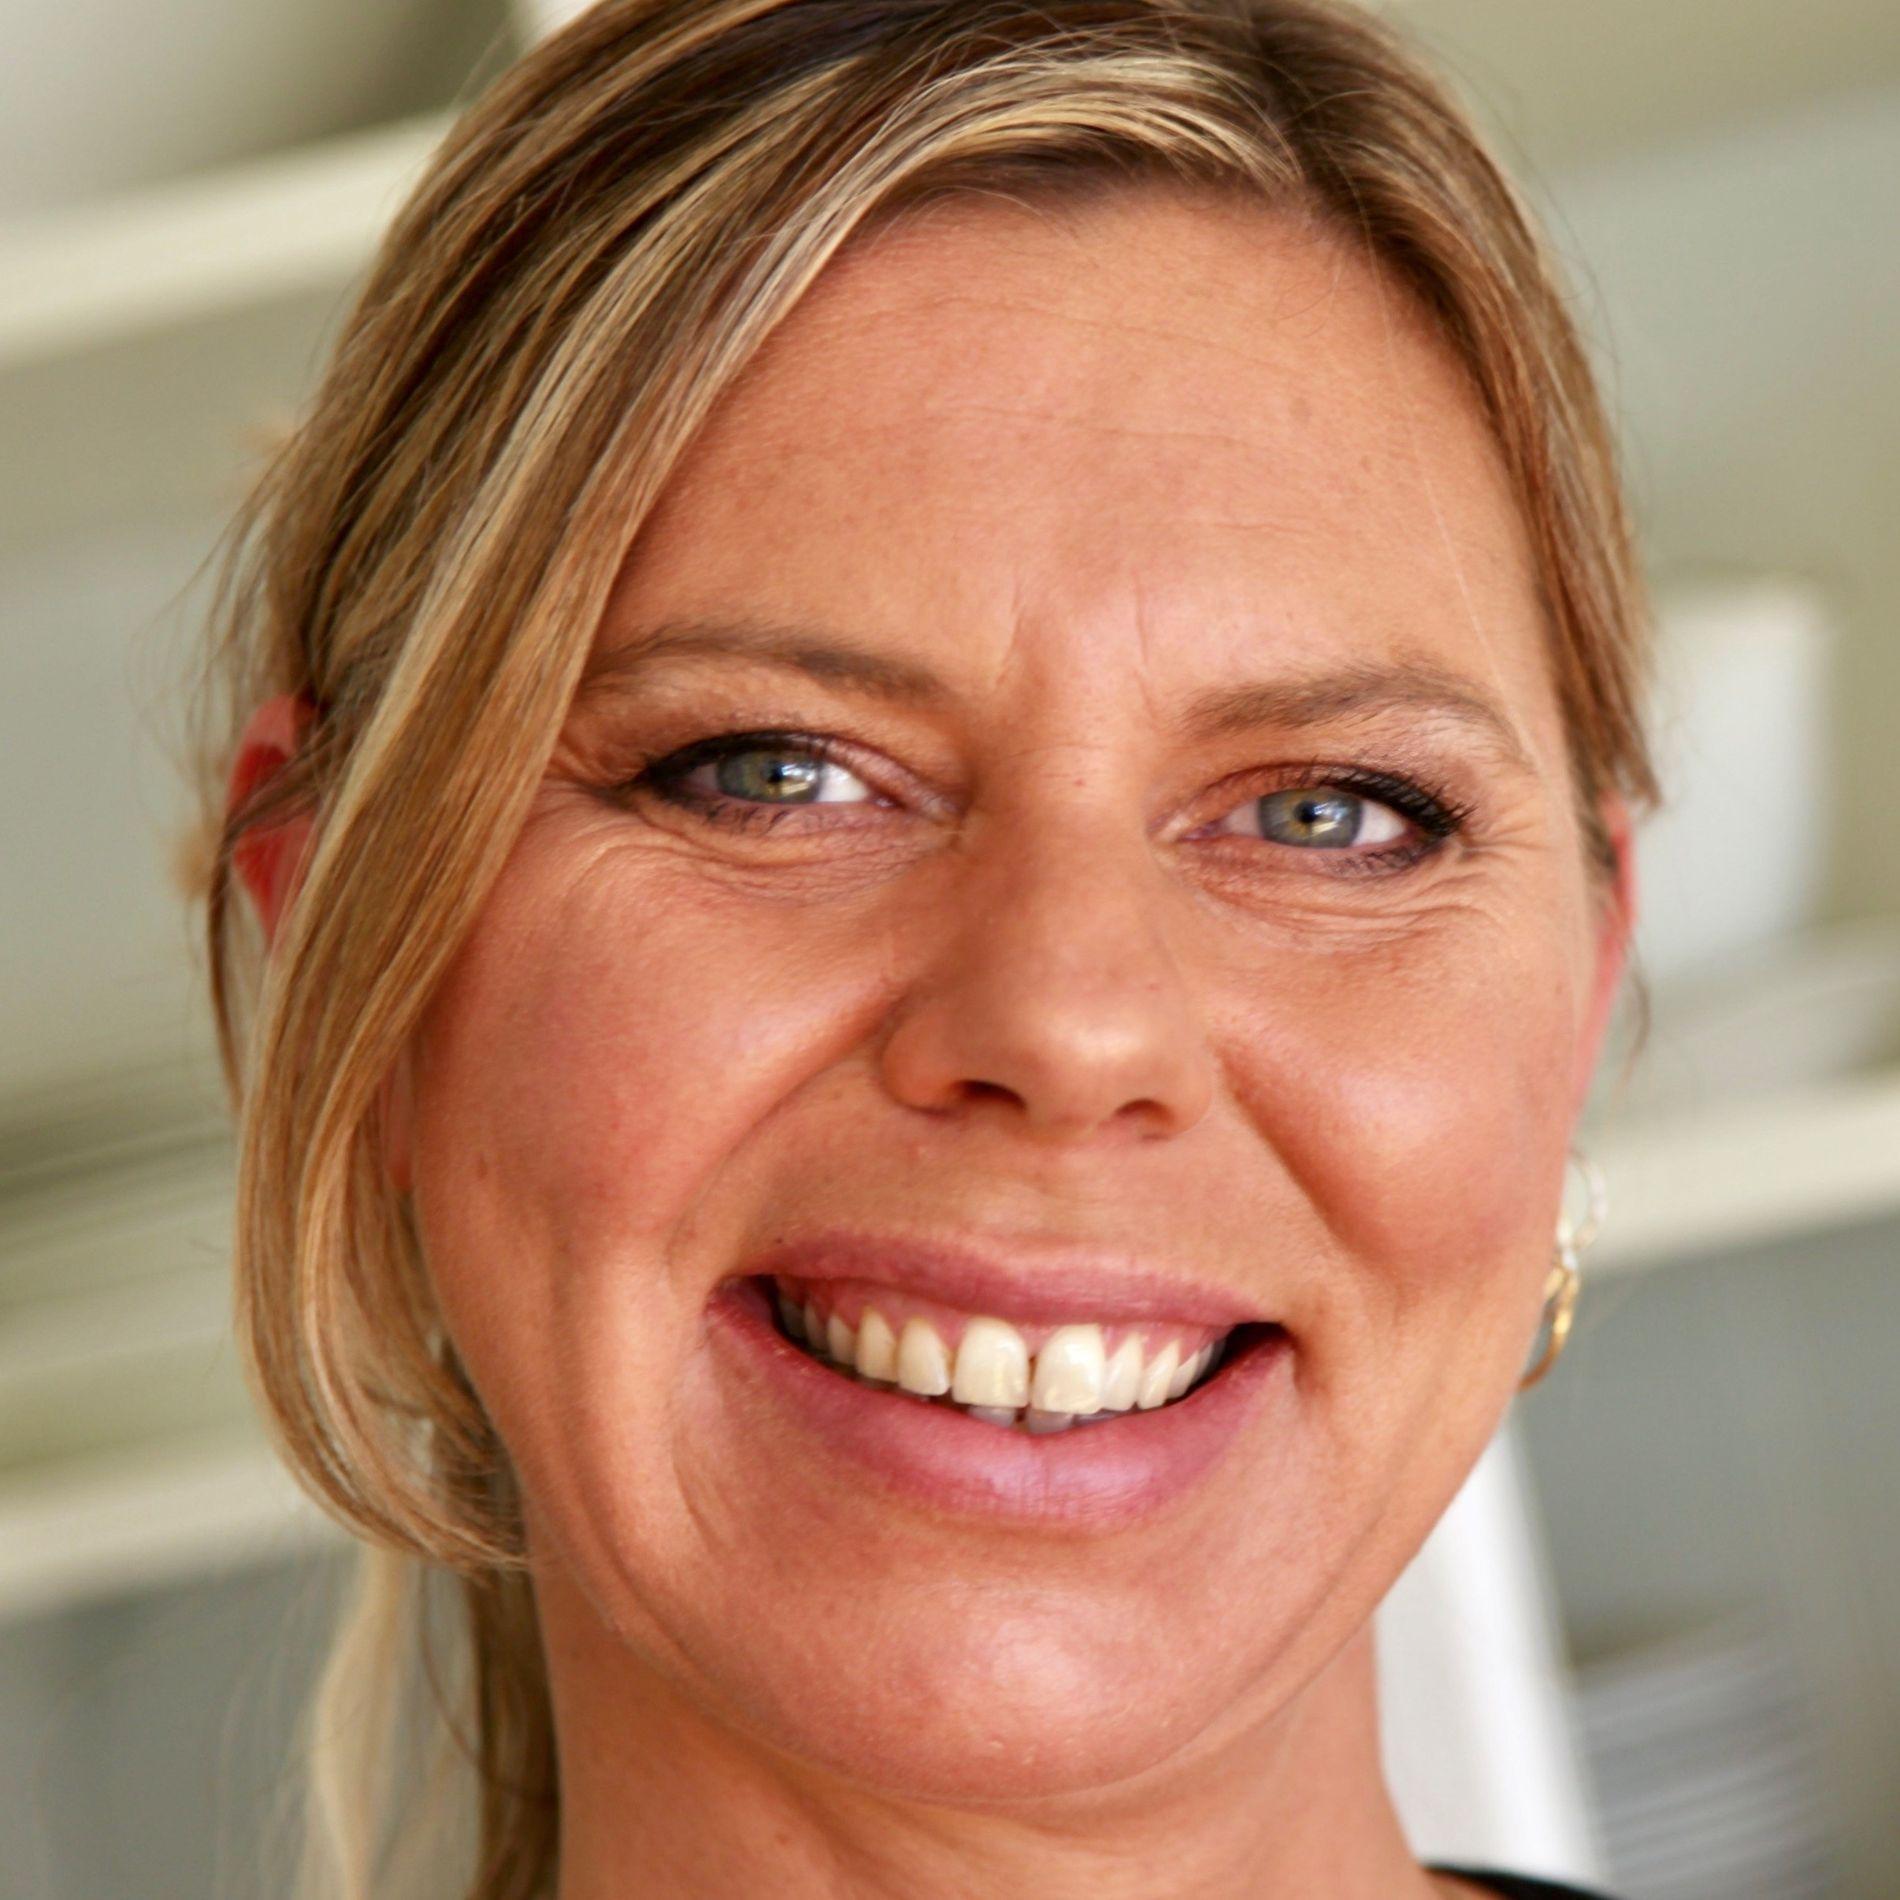 Lise Madsen